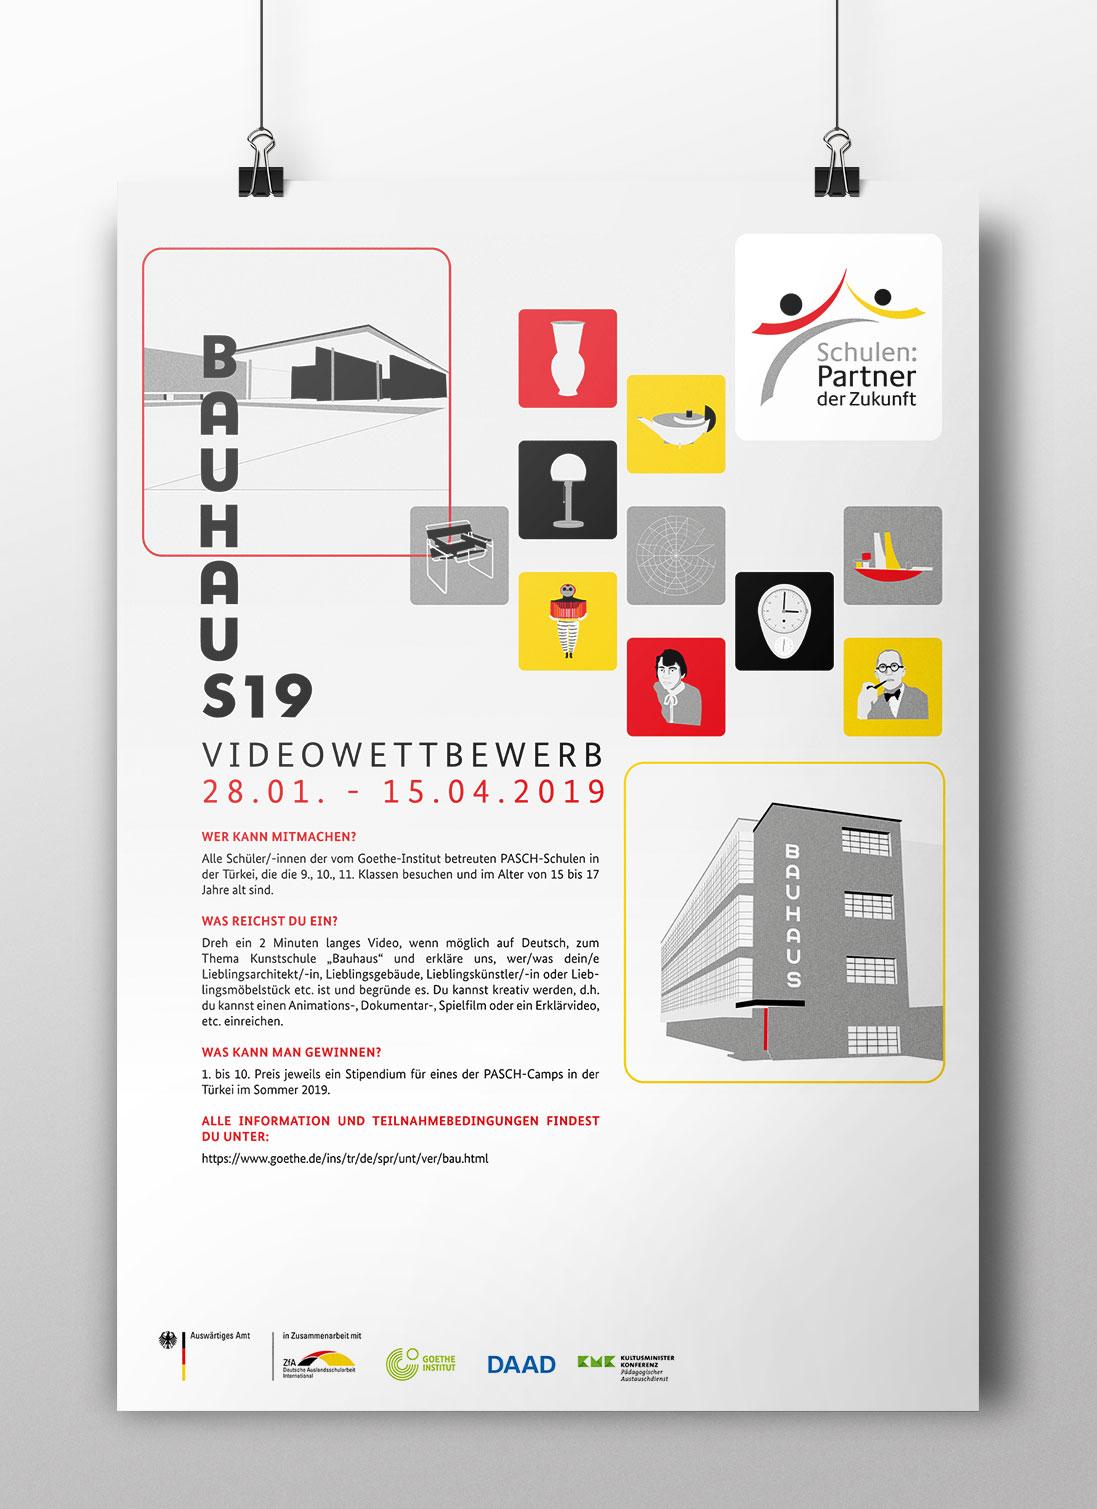 Poster-Mockup_2_Bauhaus_Goethe_Institut_70x100_1400x200px